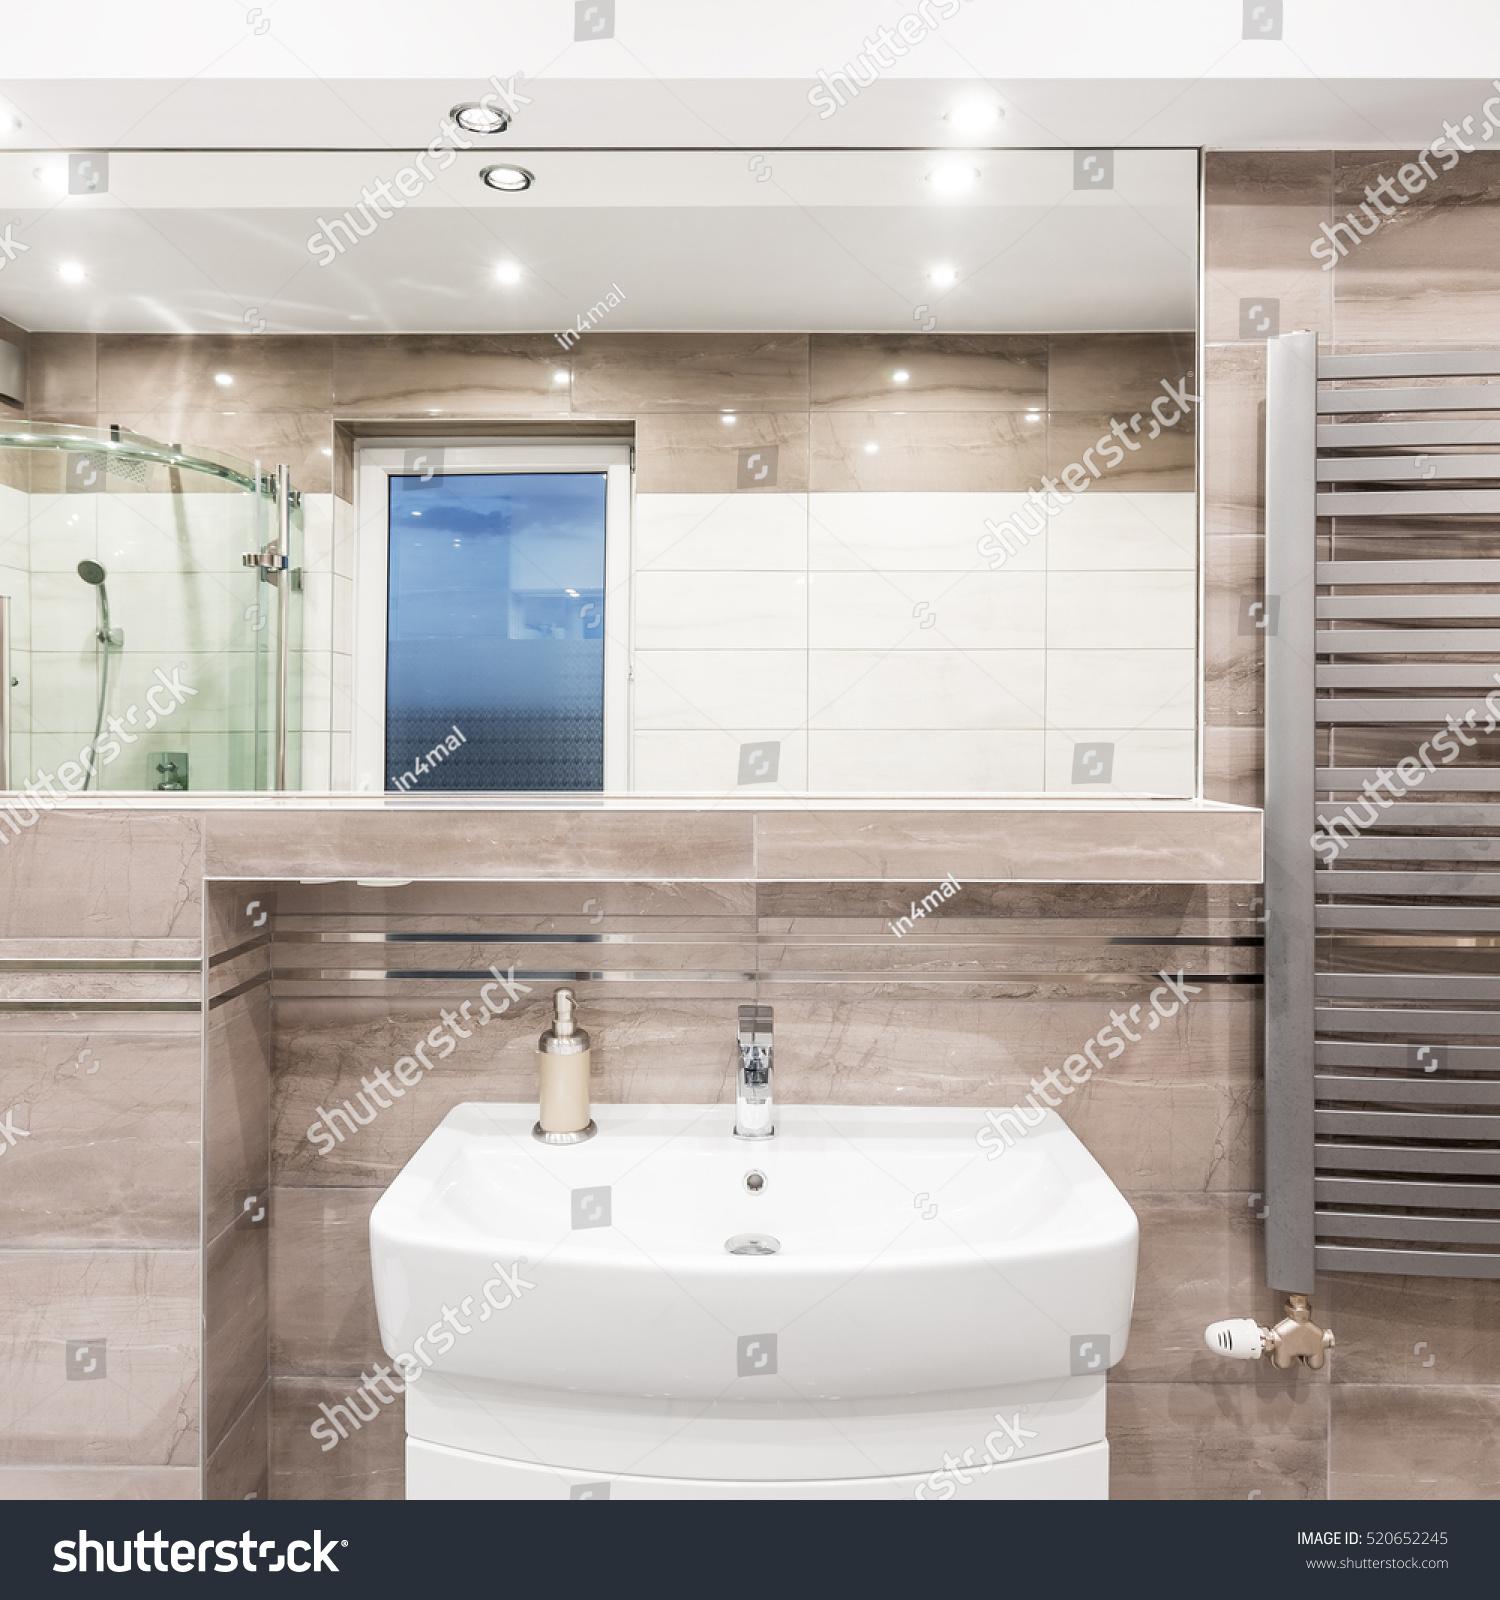 Modern bathroom interior with brown and beige tiles, large bathtub ...